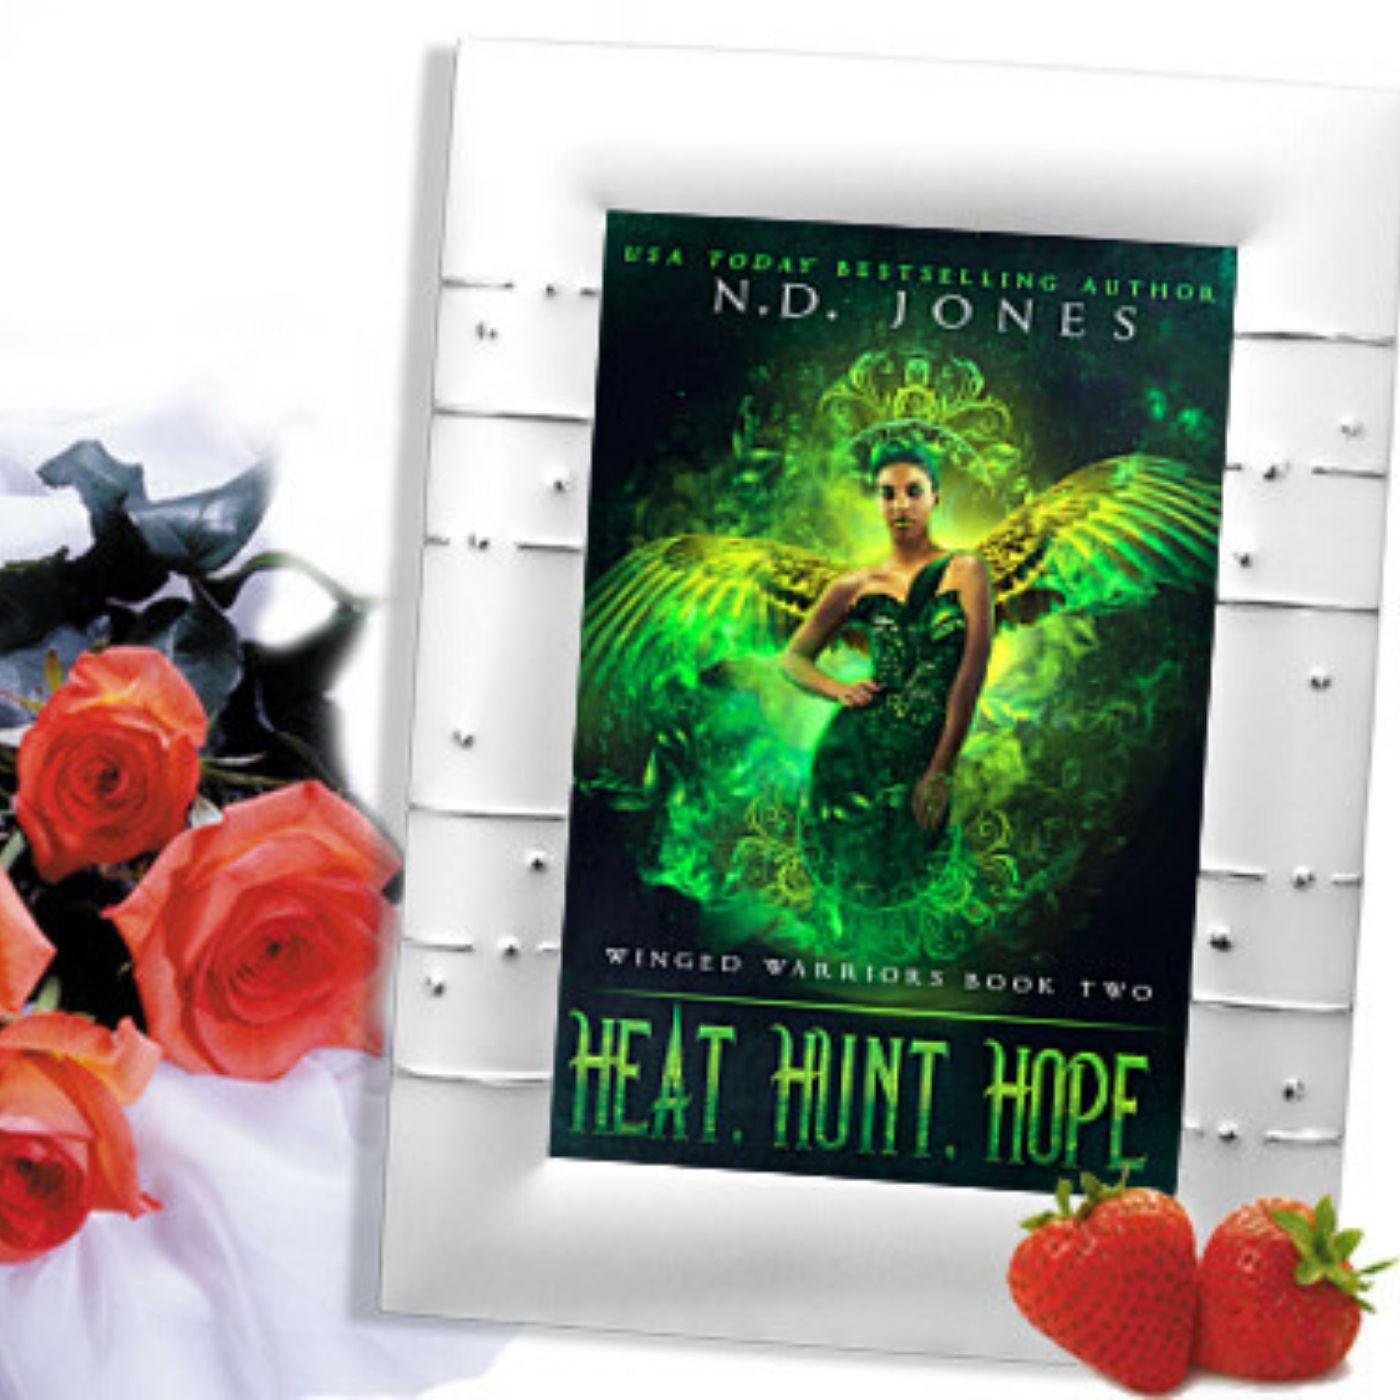 African American Urban Fantasy Romance by ND Jones-Heat, Hunt, Hope